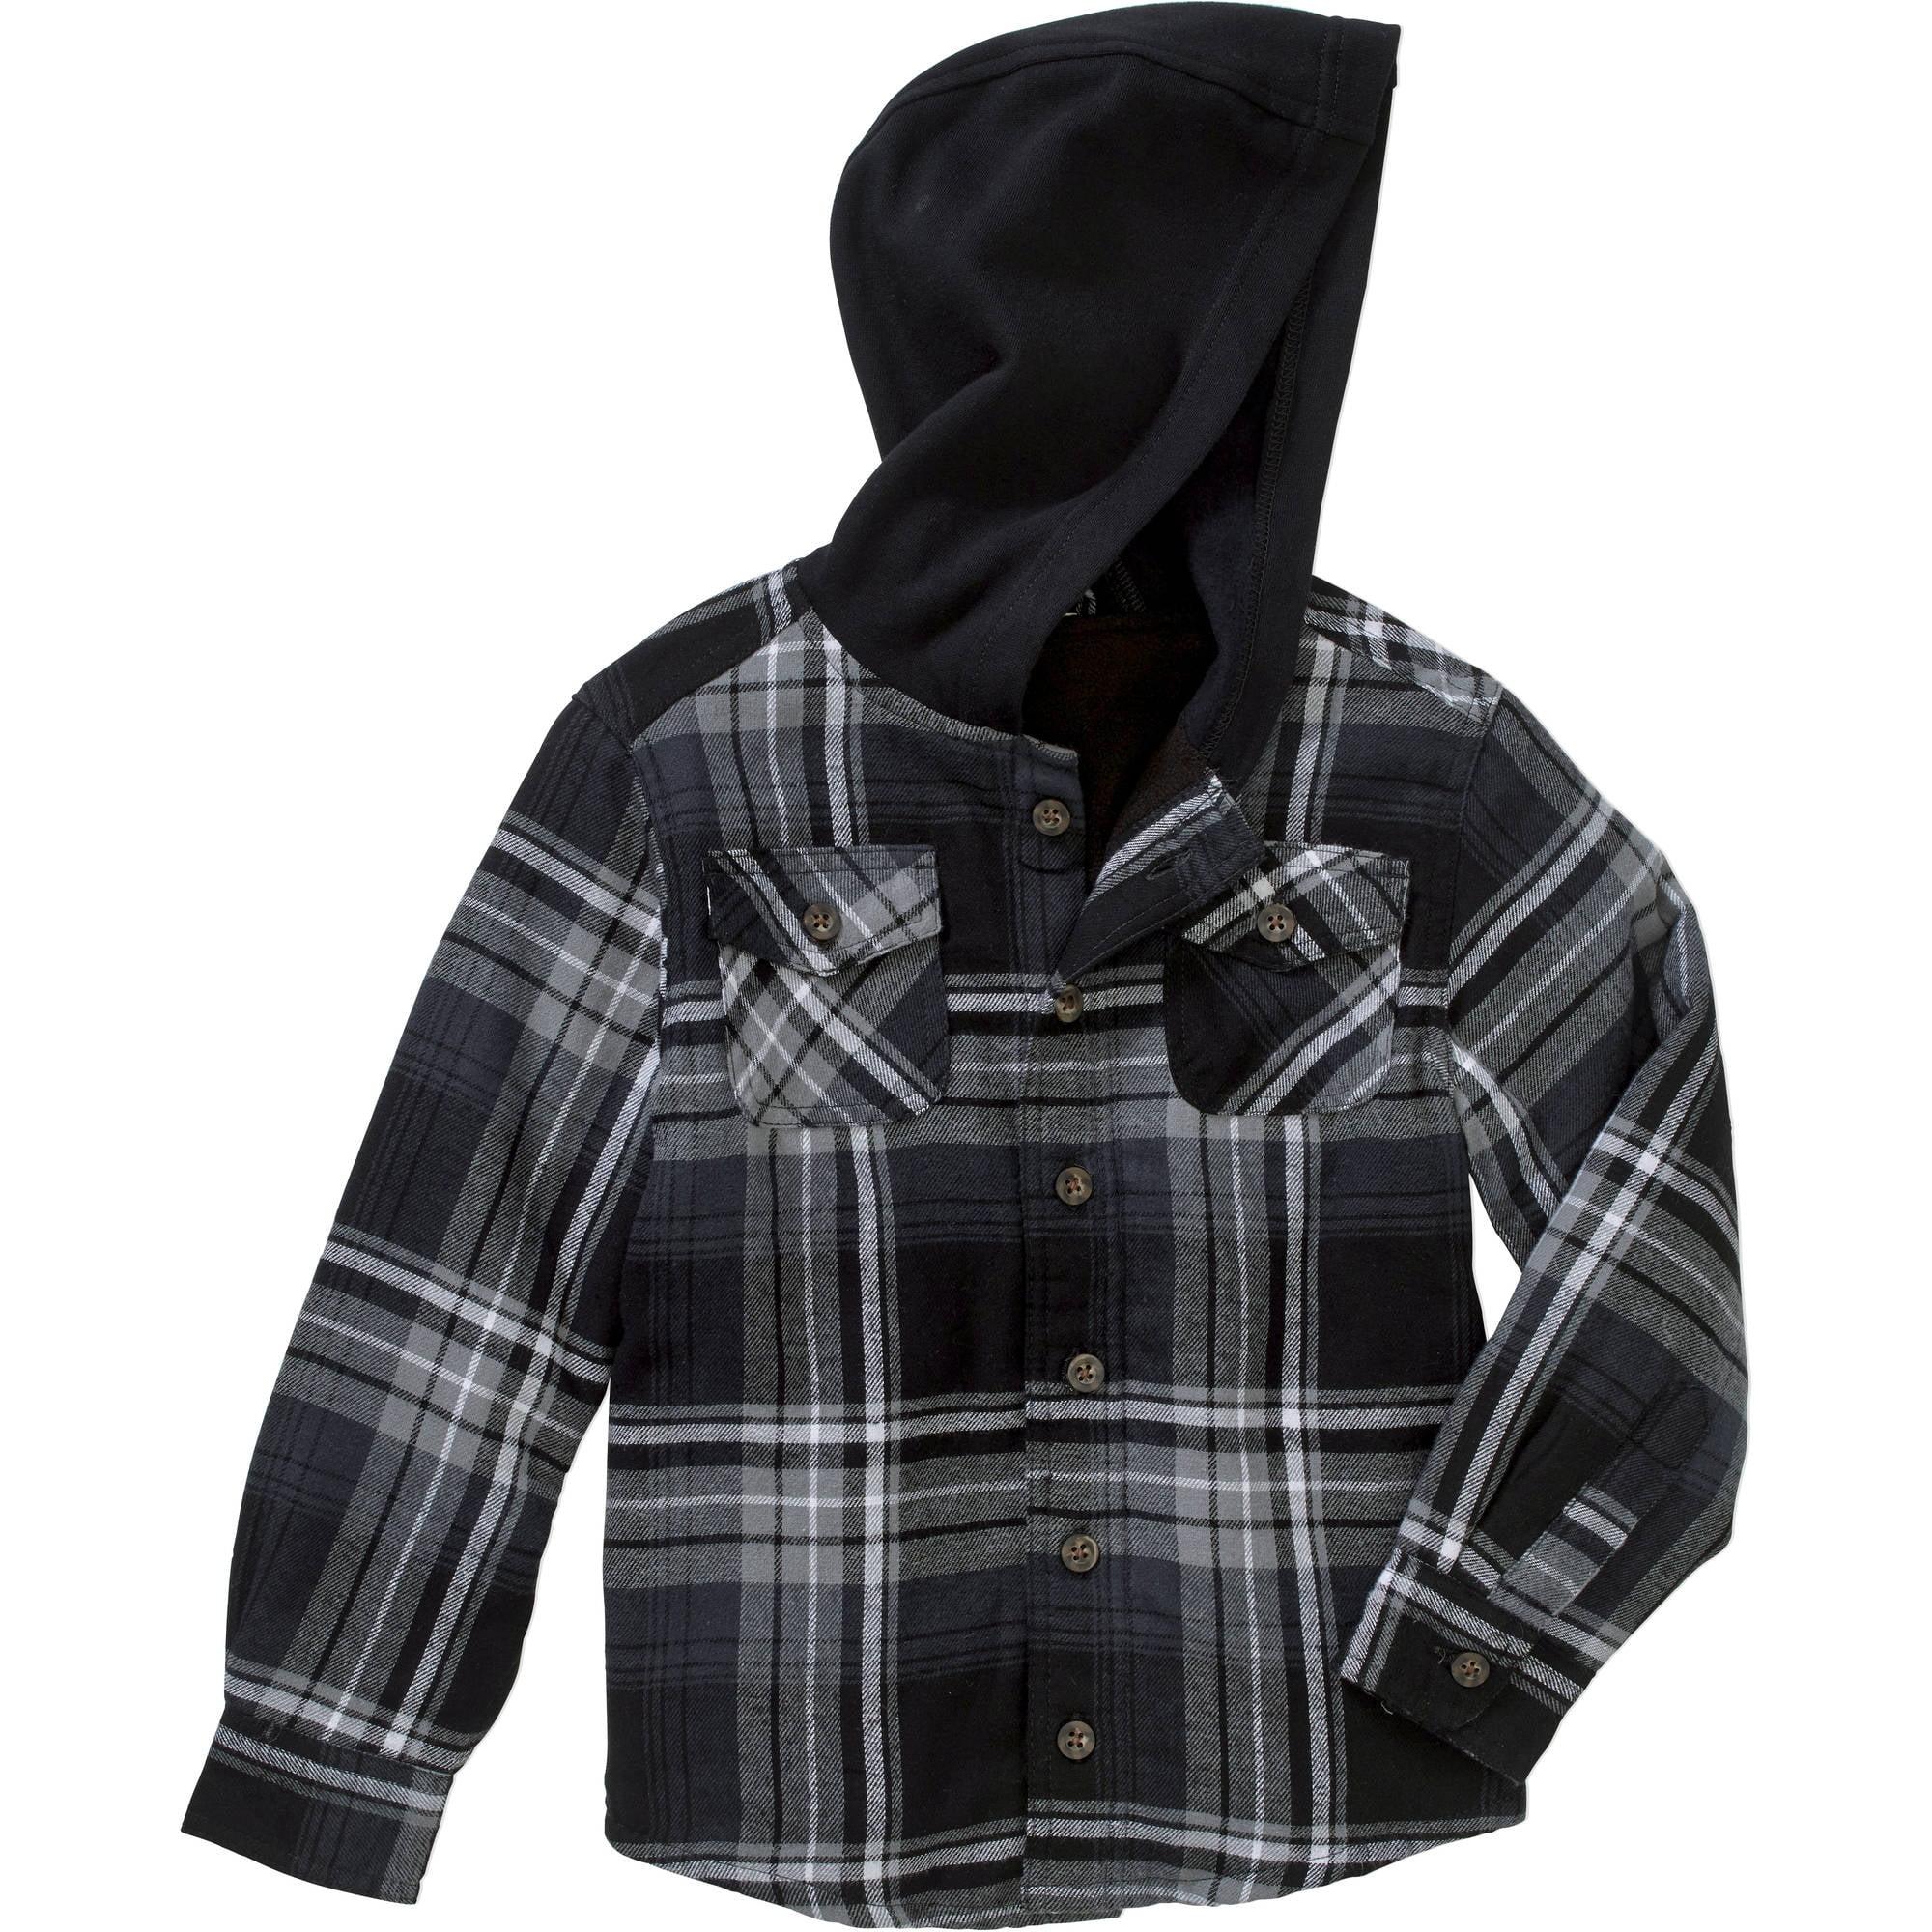 Faded Glory Boys' Lined Flannel Shirt Jacket